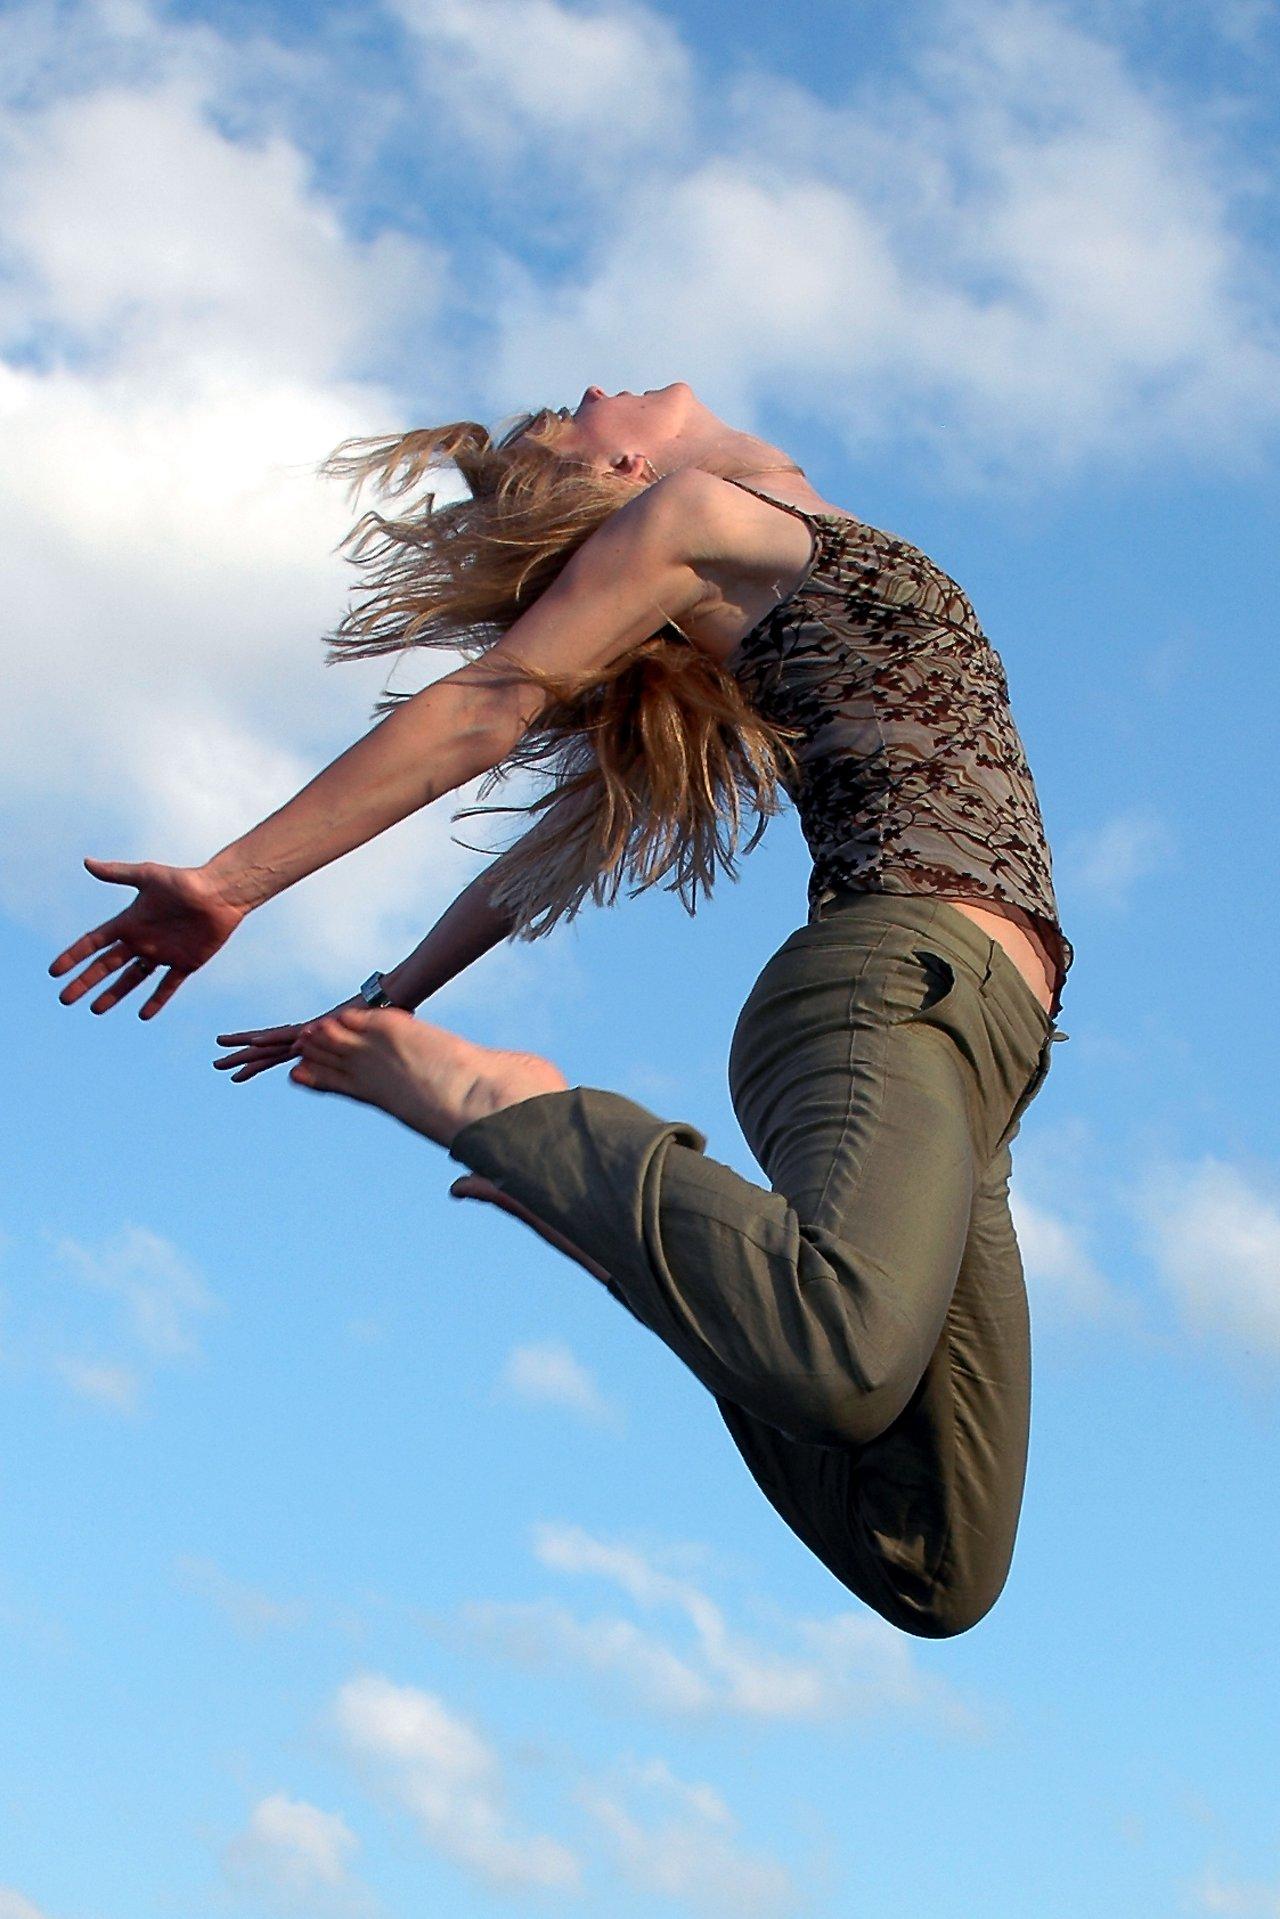 Karlijn in mid air